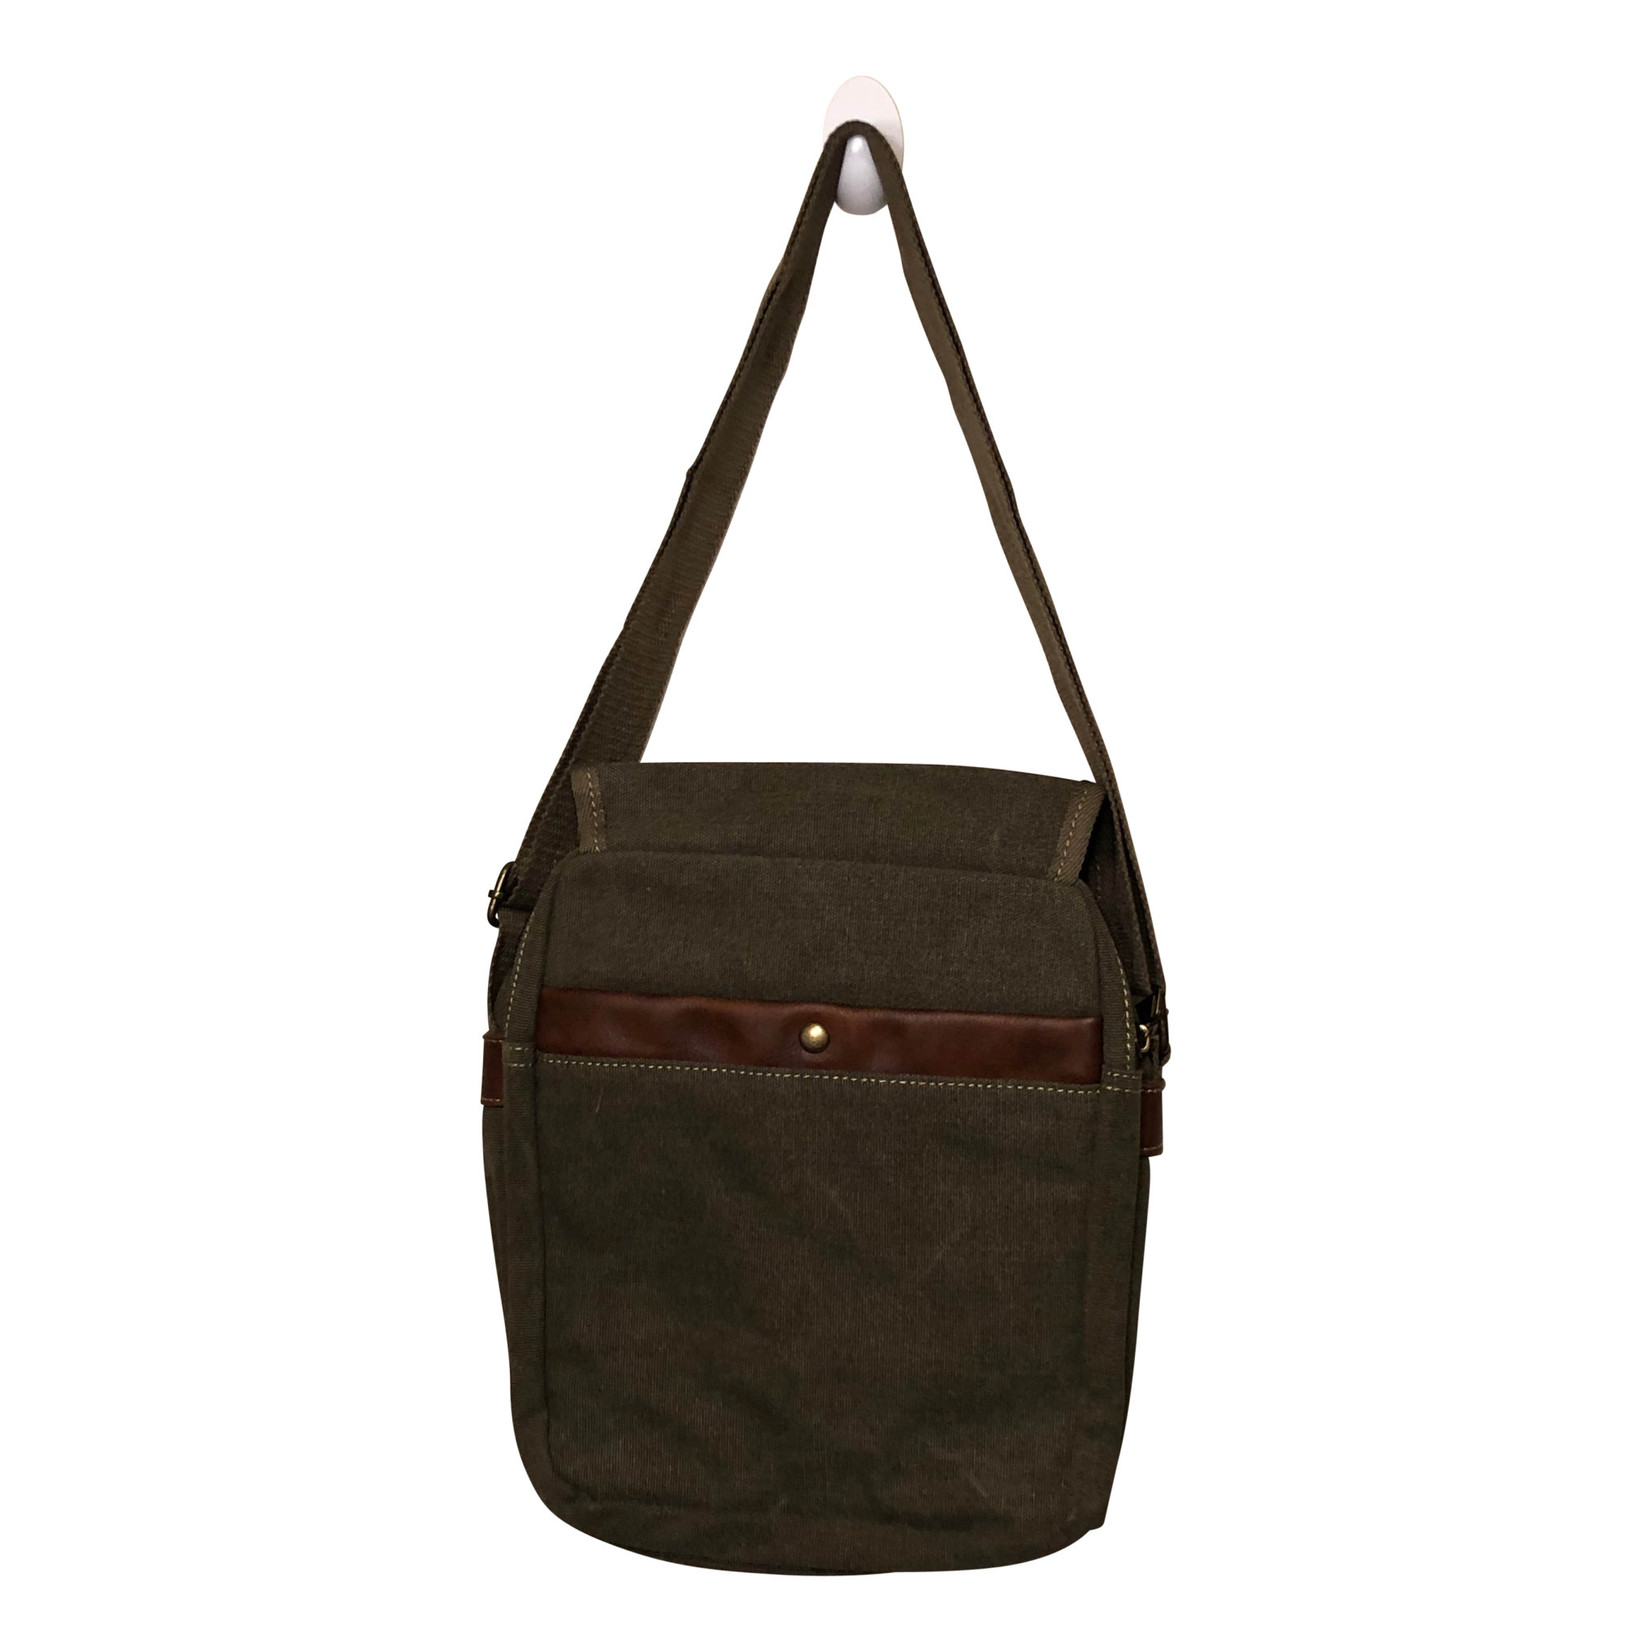 Triple Tree Canvas 3968 Green Shoulder/Crossbody Bag